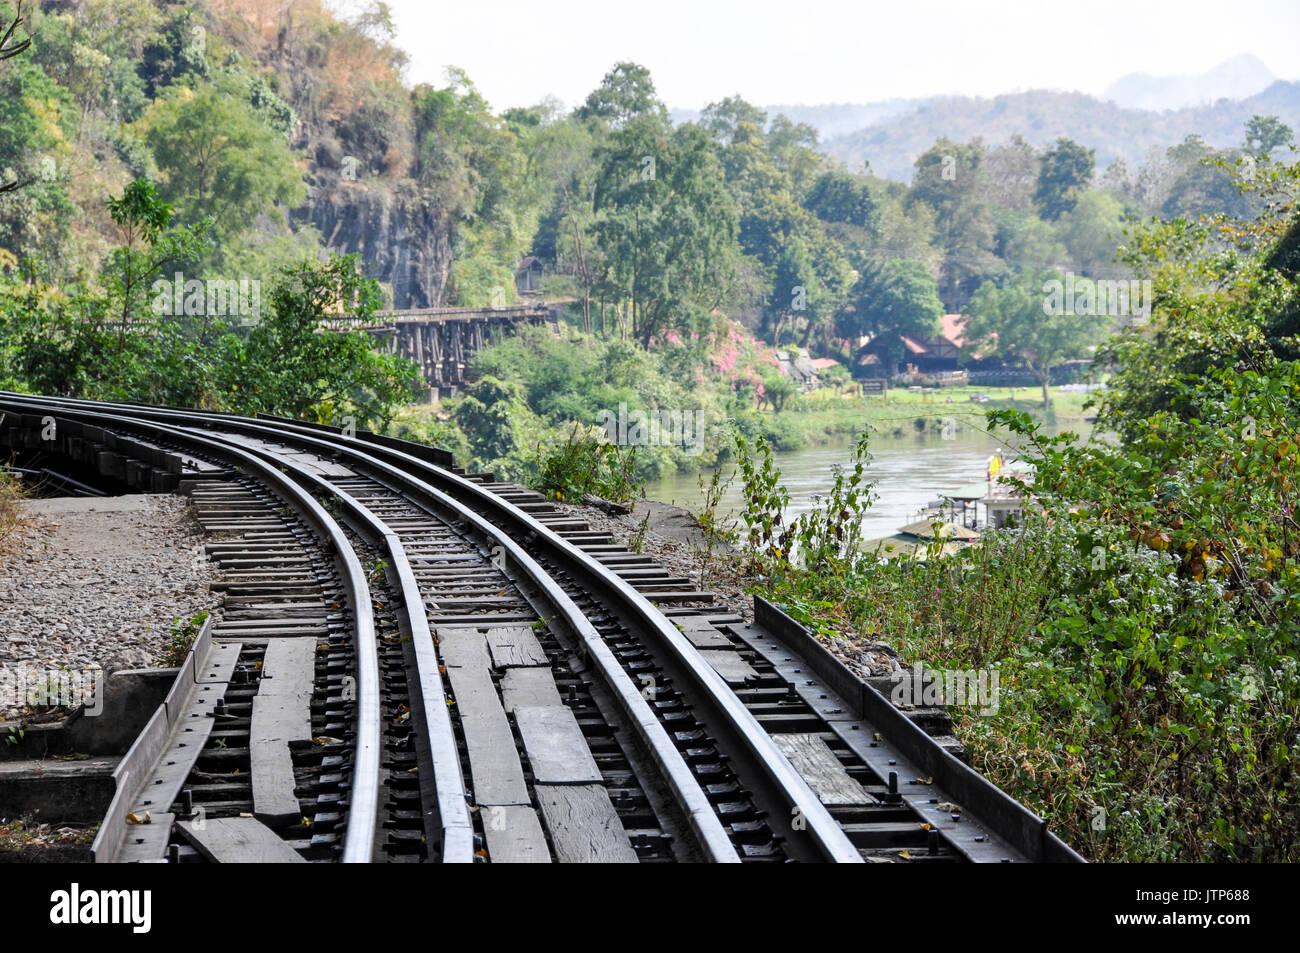 Portion of the Thailand-Burma Railway along the River Kwai, Thailand. Stock Photo